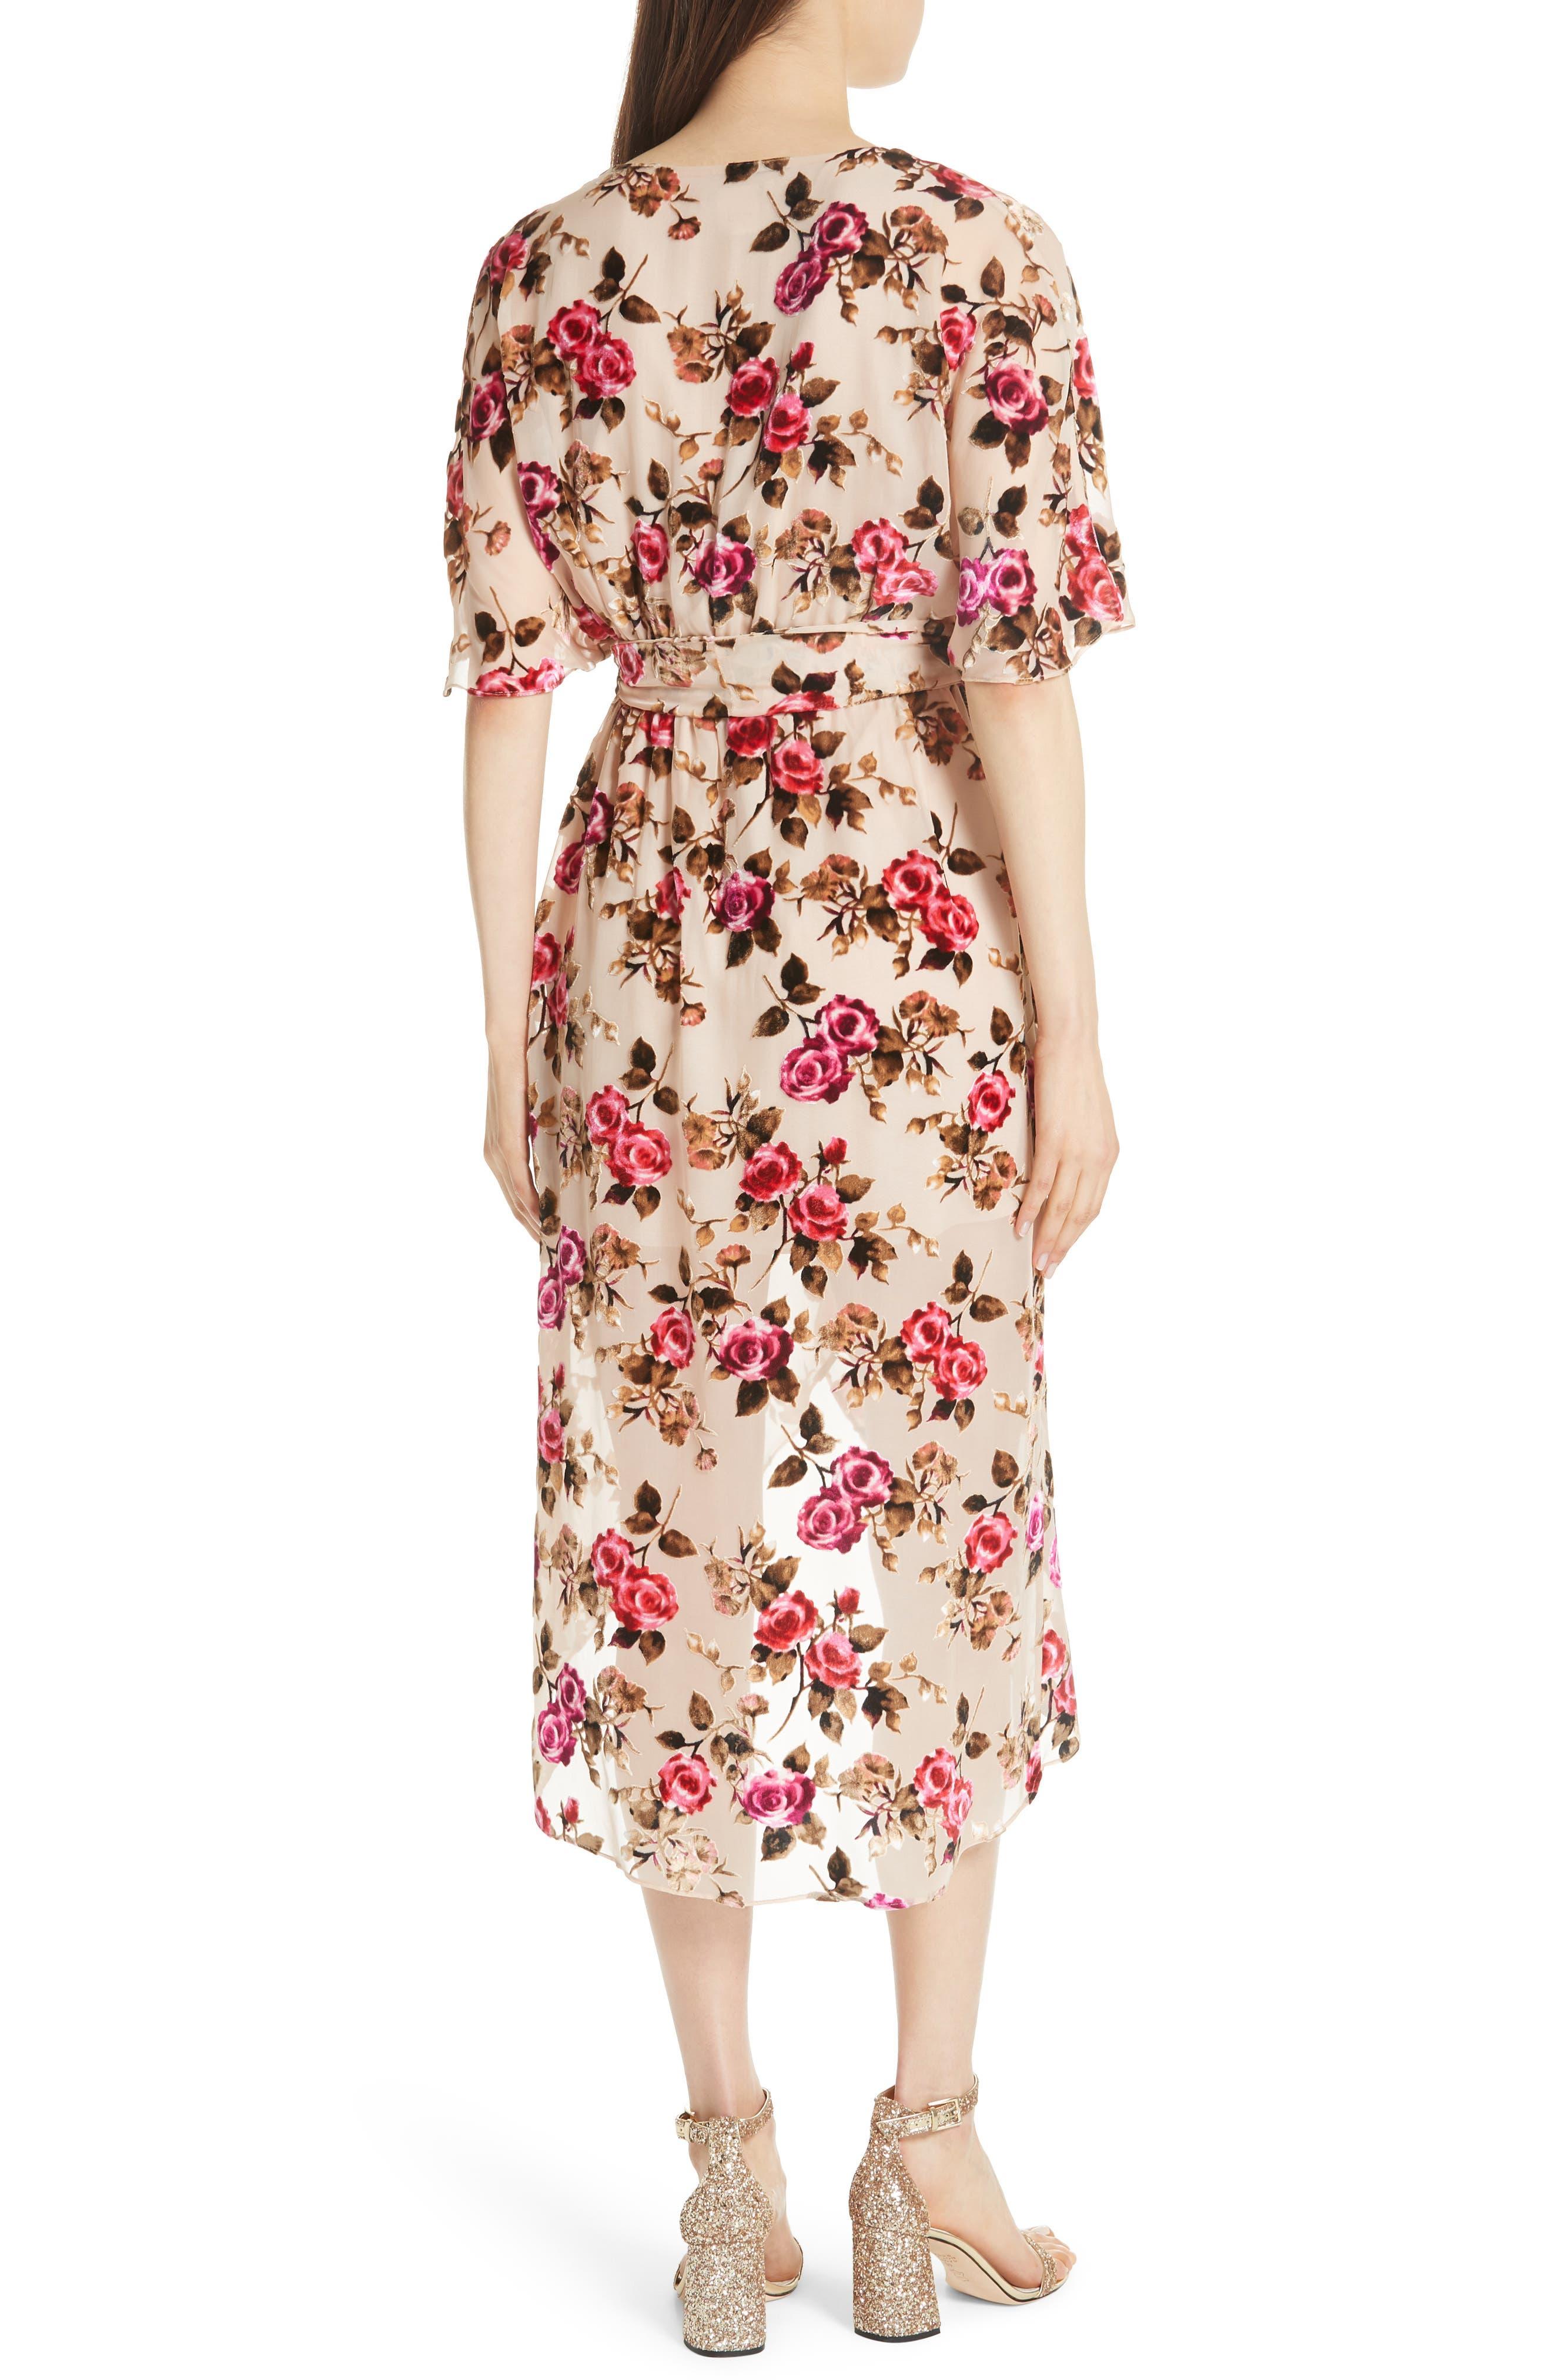 ALICE + OLIVIA,                             Clarine Floral Faux Wrap Dress,                             Alternate thumbnail 2, color,                             251